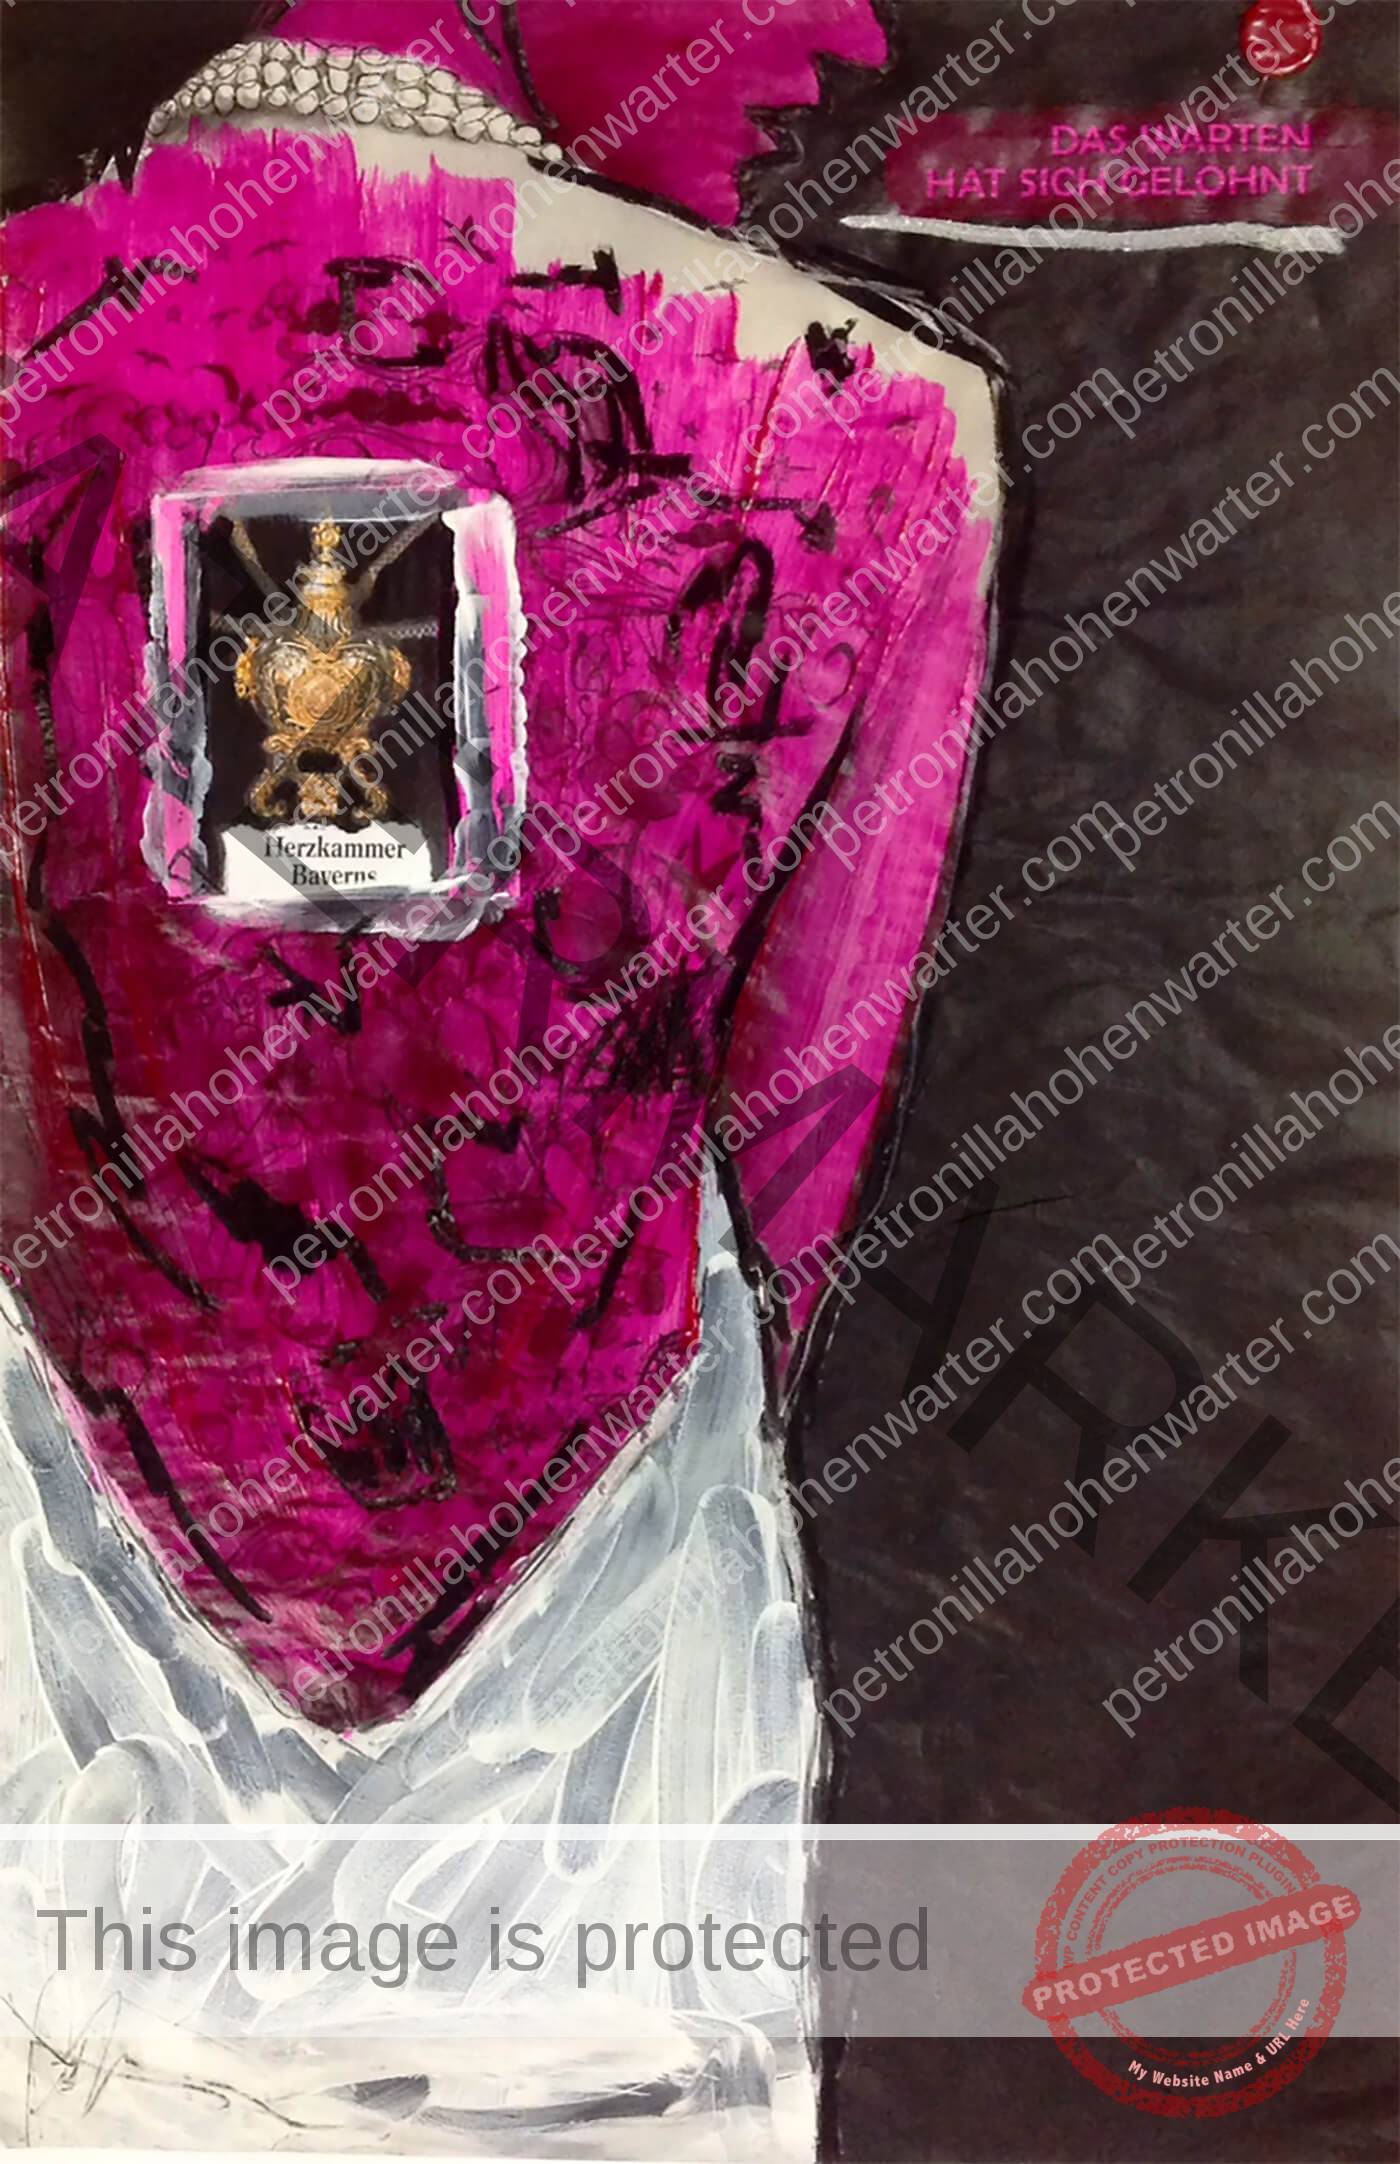 quo vadis Herzkammer bayern artist pink figure woman